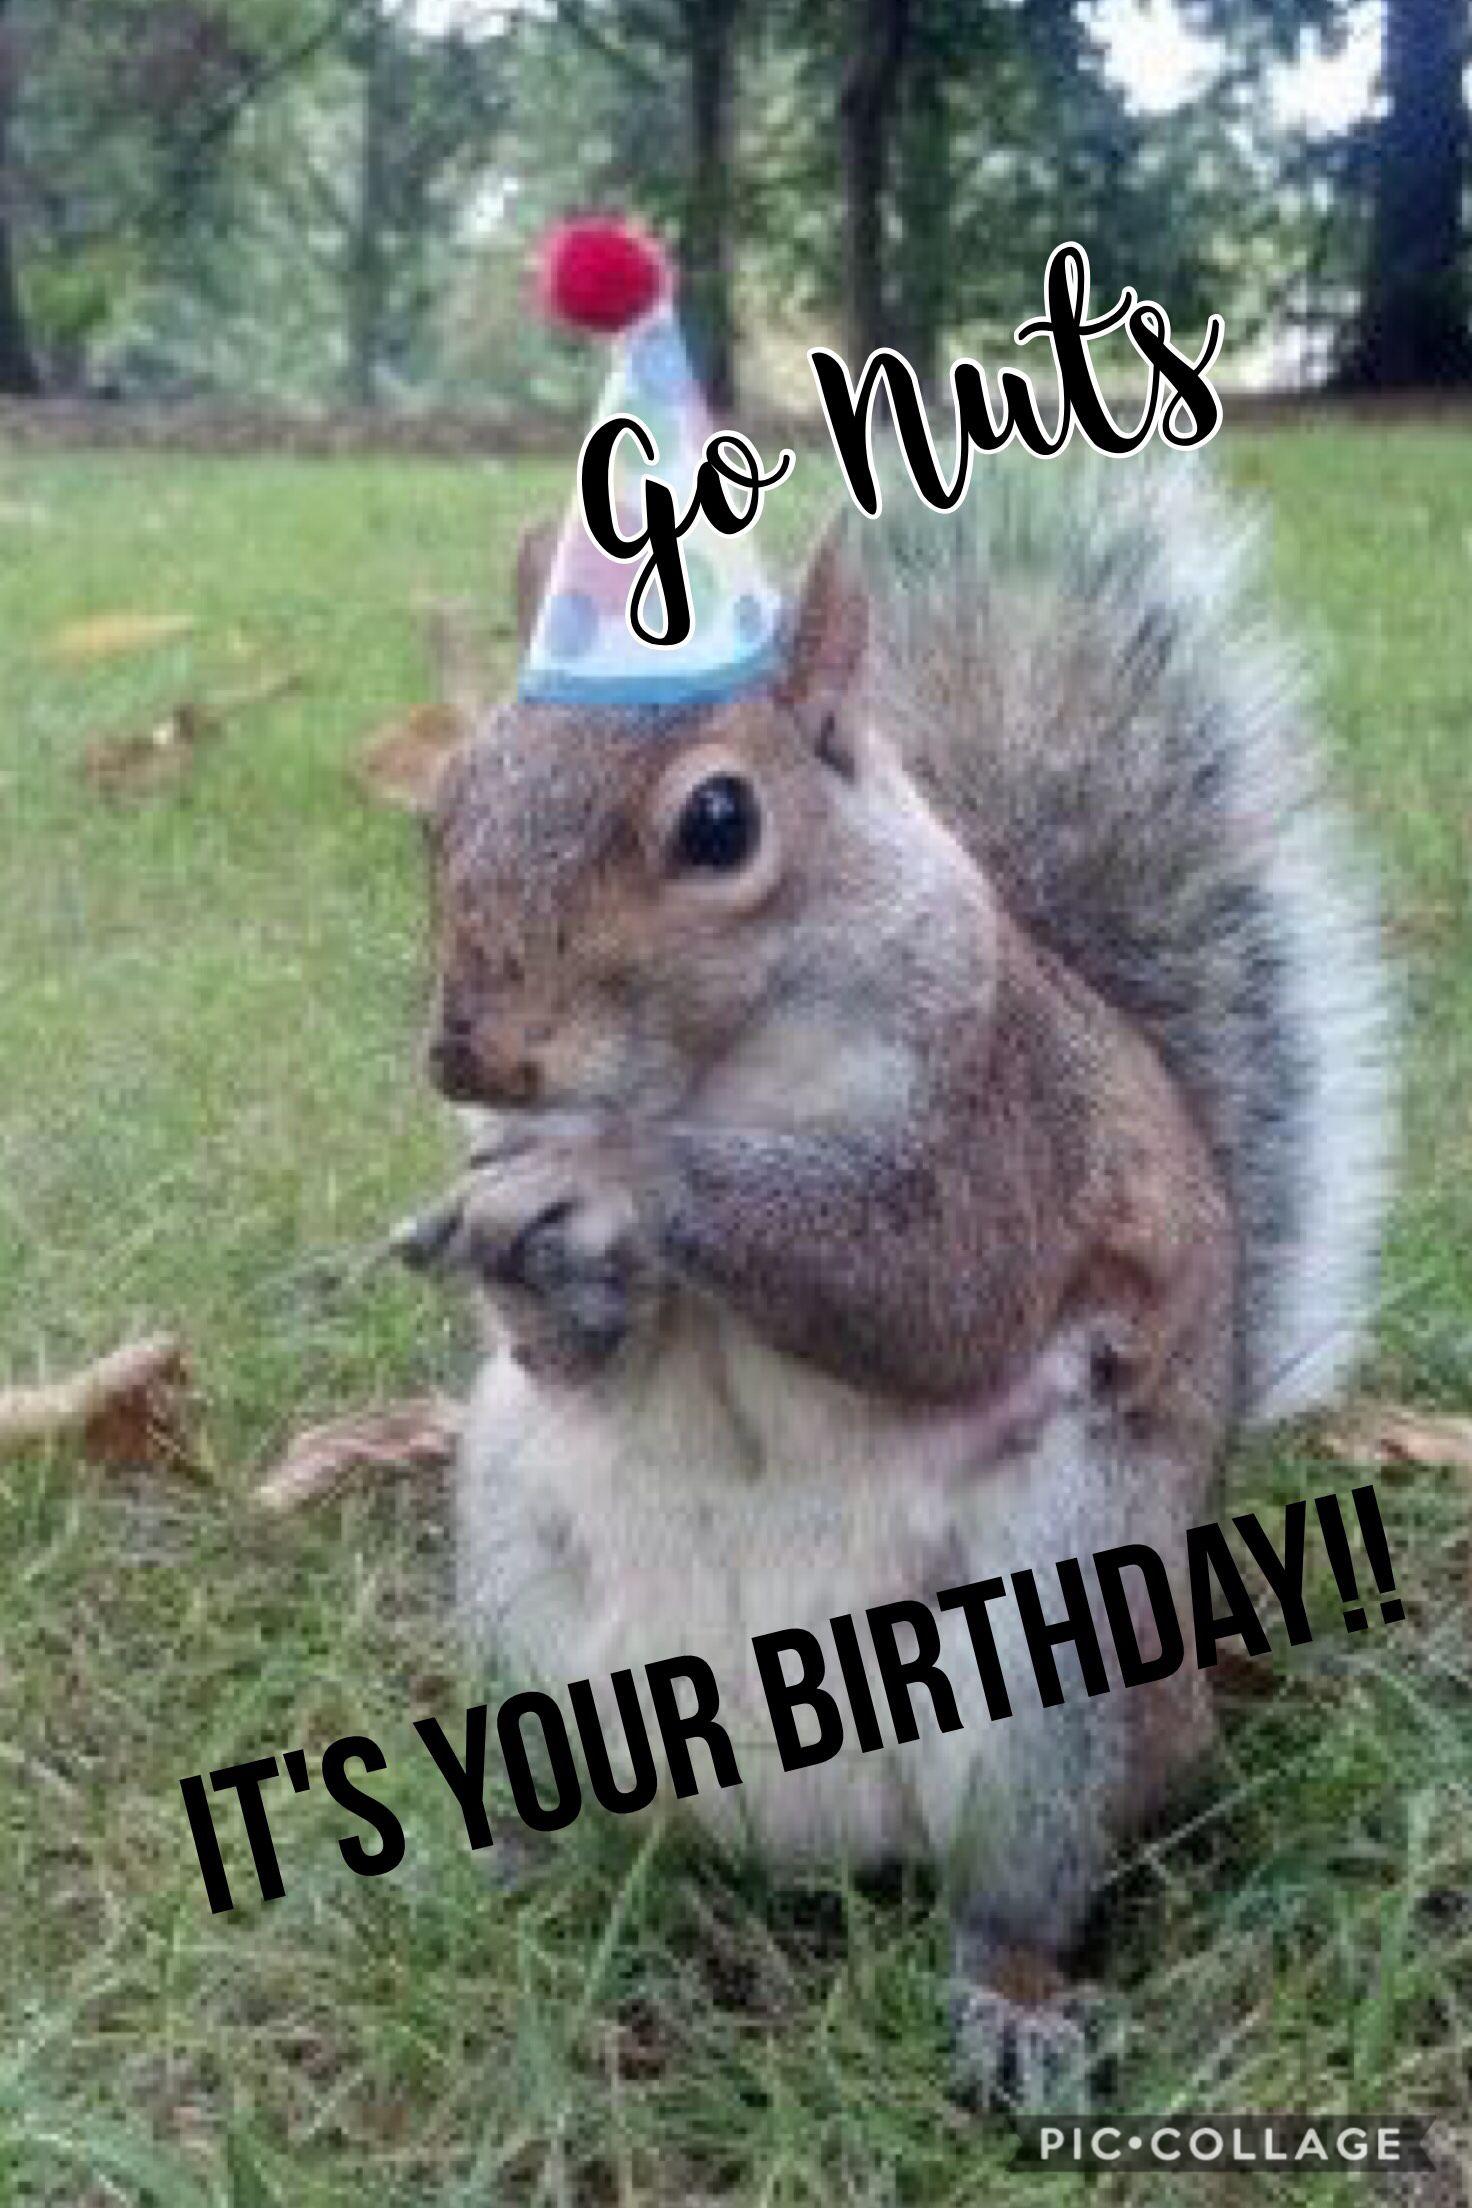 Go nuts! It's your birthday! Happy birthday squirrel